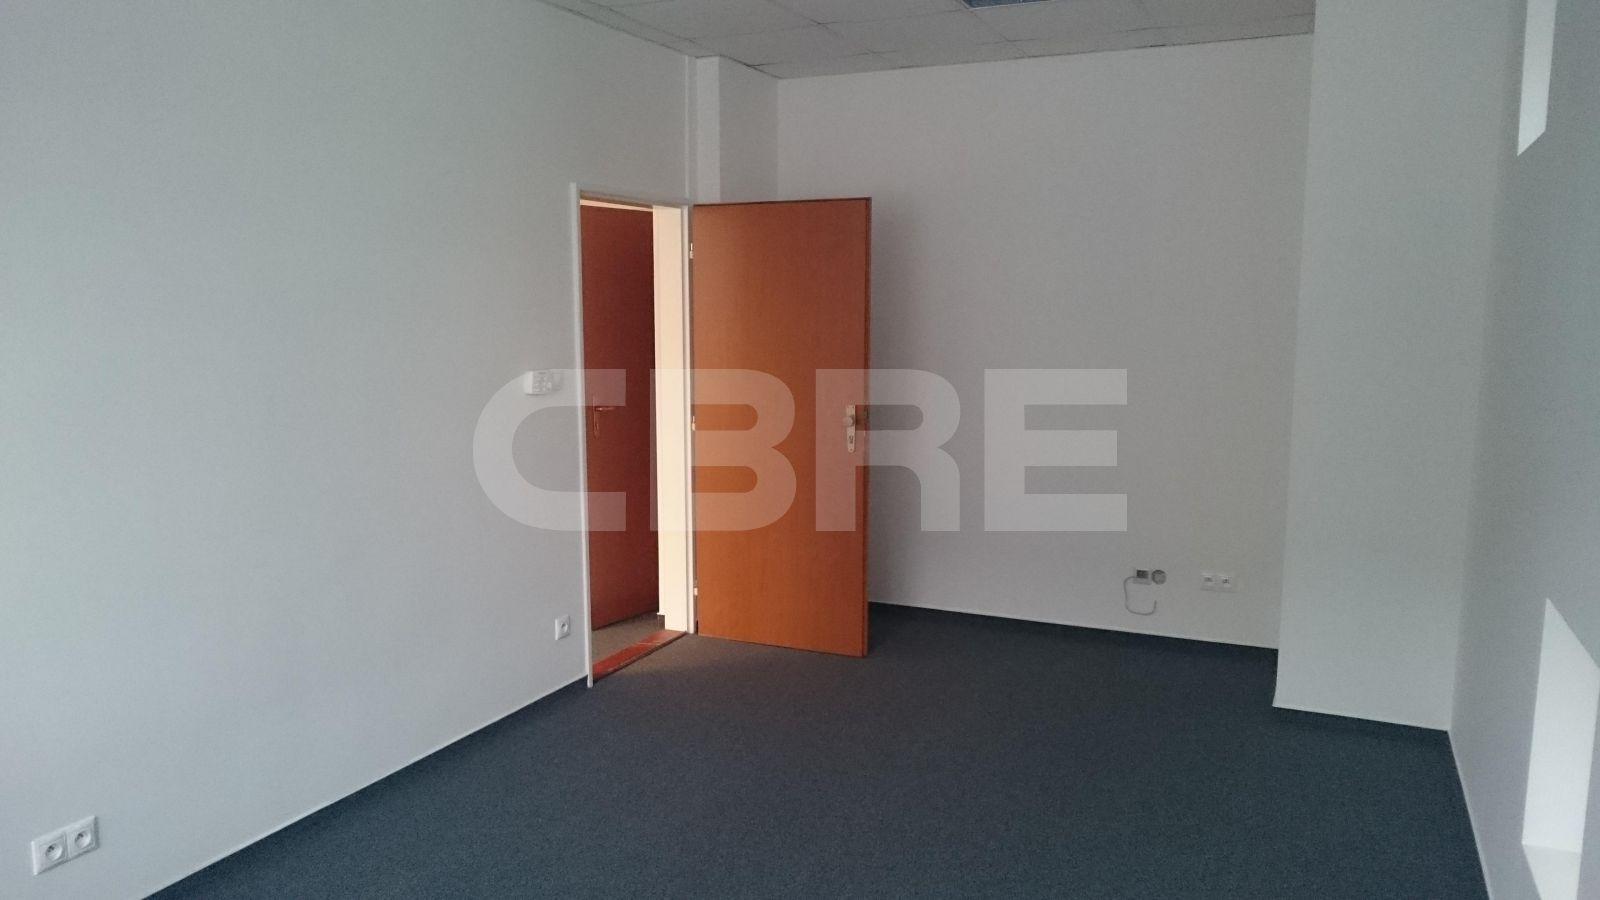 Aston - Bajkalská 22, Bratislava - Ružinov | Offices for rent by CBRE | 3